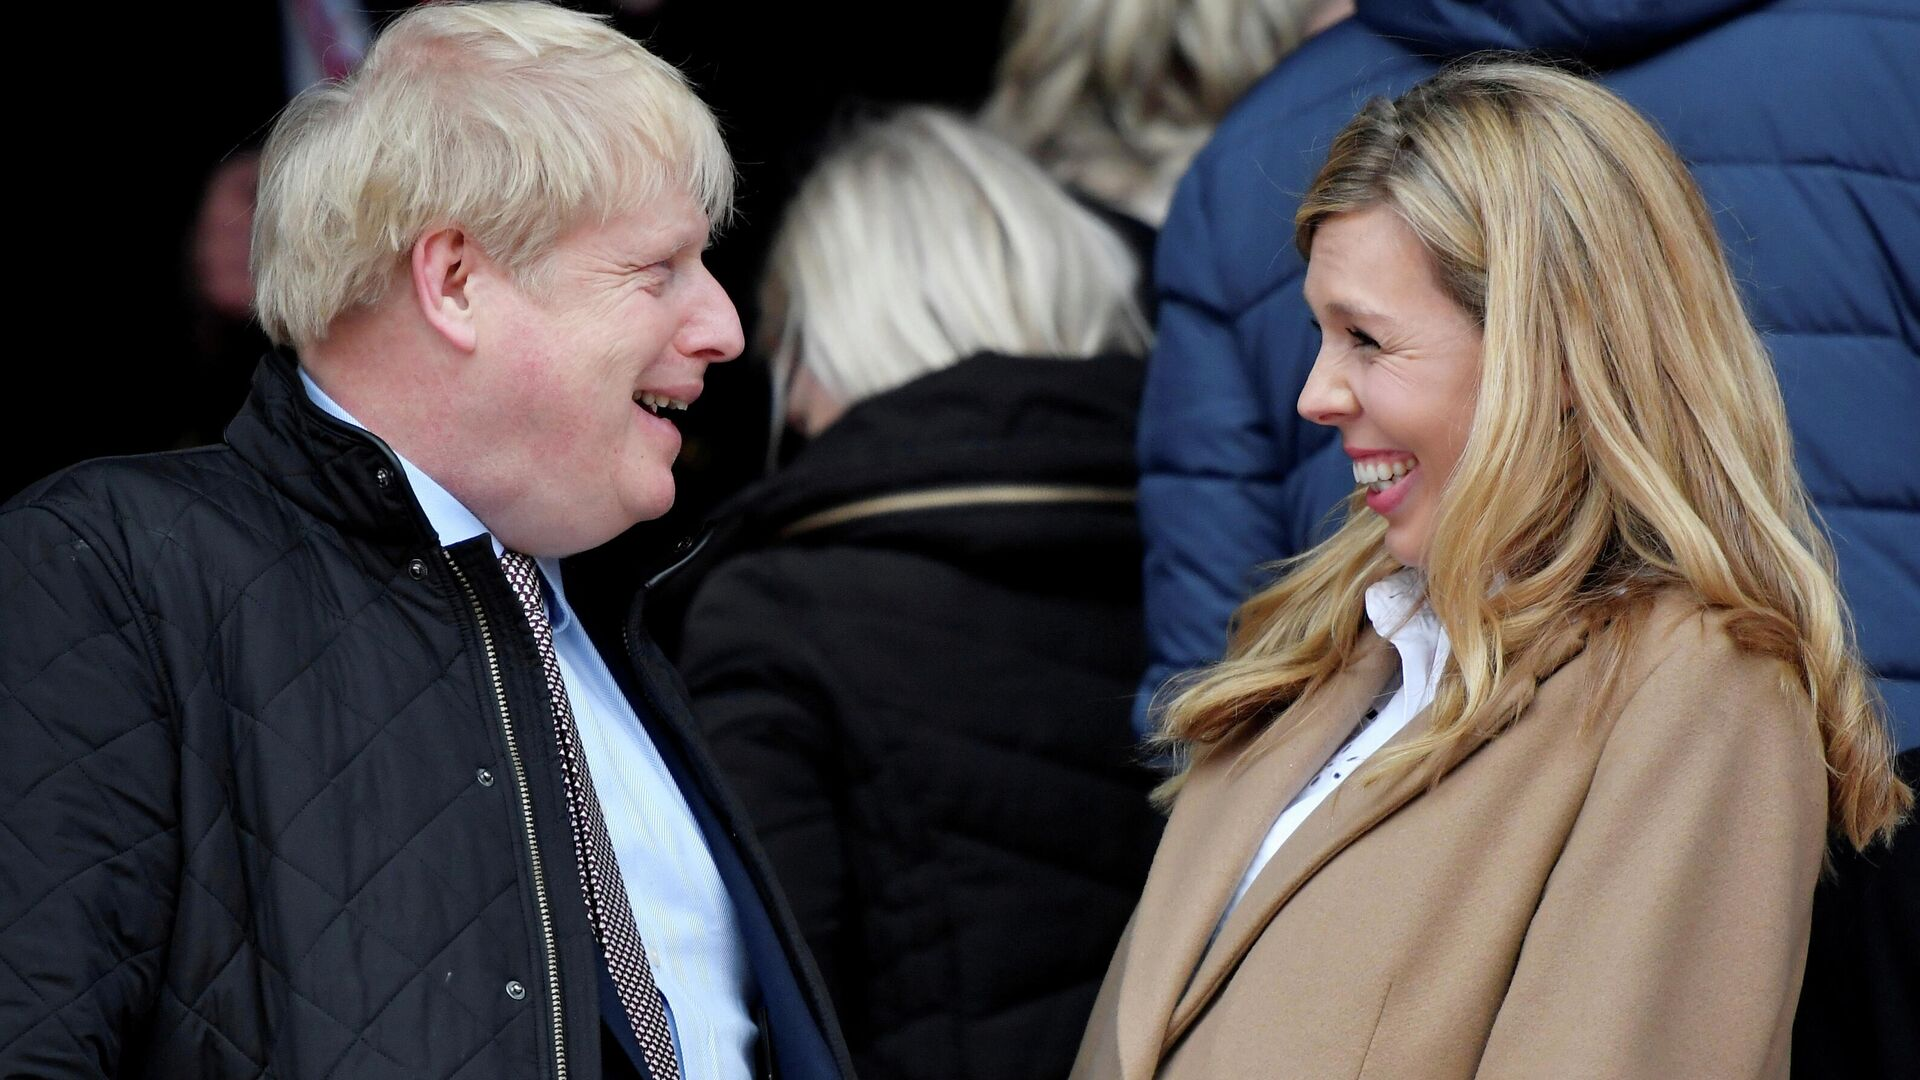 El primer ministro británico, Boris Johnson, con su prometida, Carrie Symonds (archivo) - Sputnik Mundo, 1920, 30.05.2021